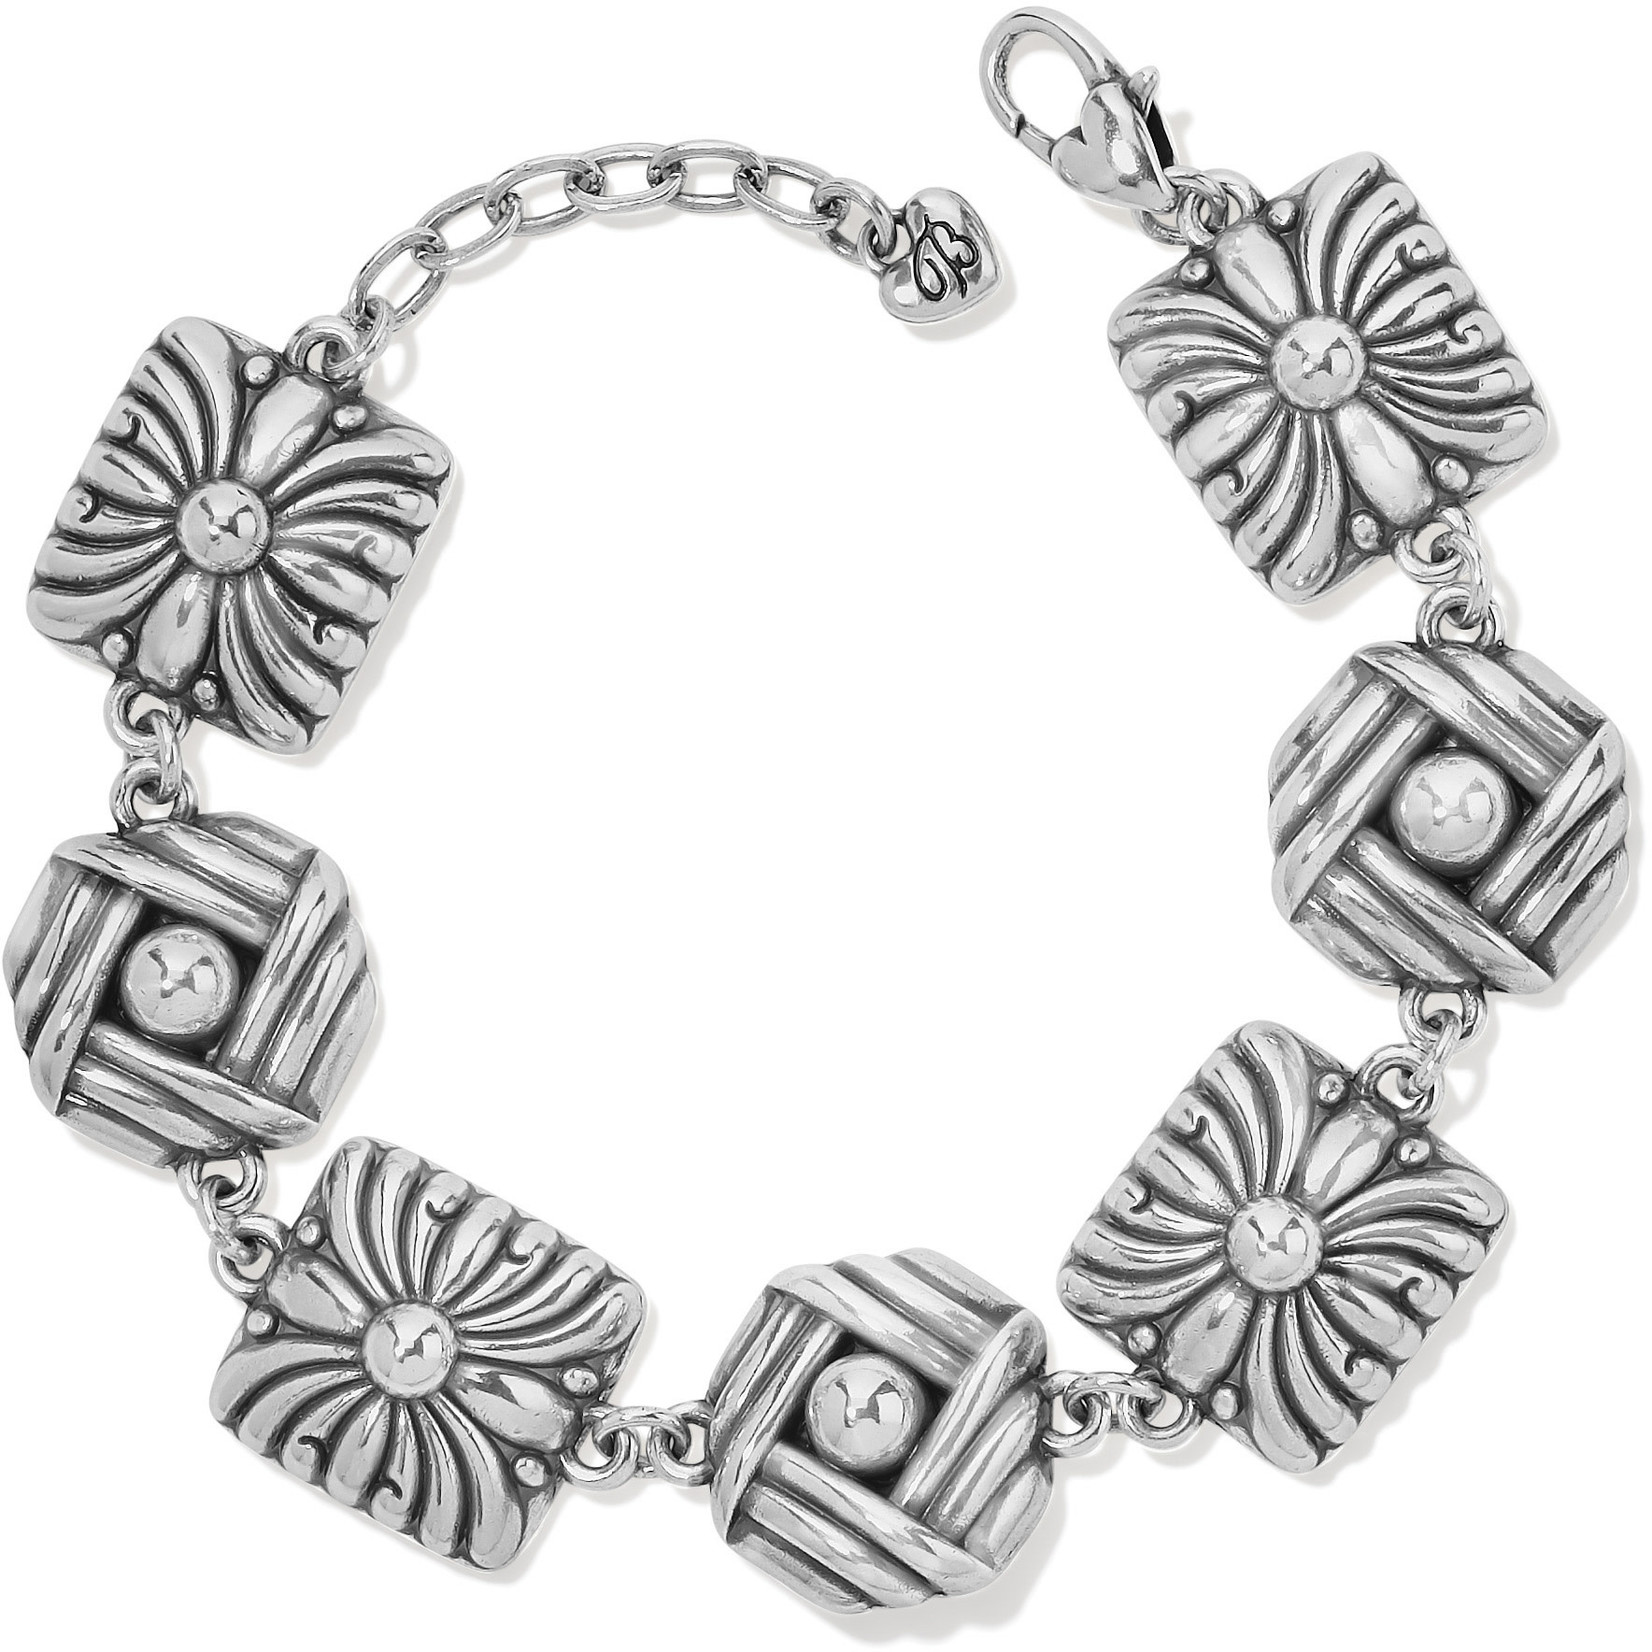 Brighton Sonora Motif Bracelet - Silver